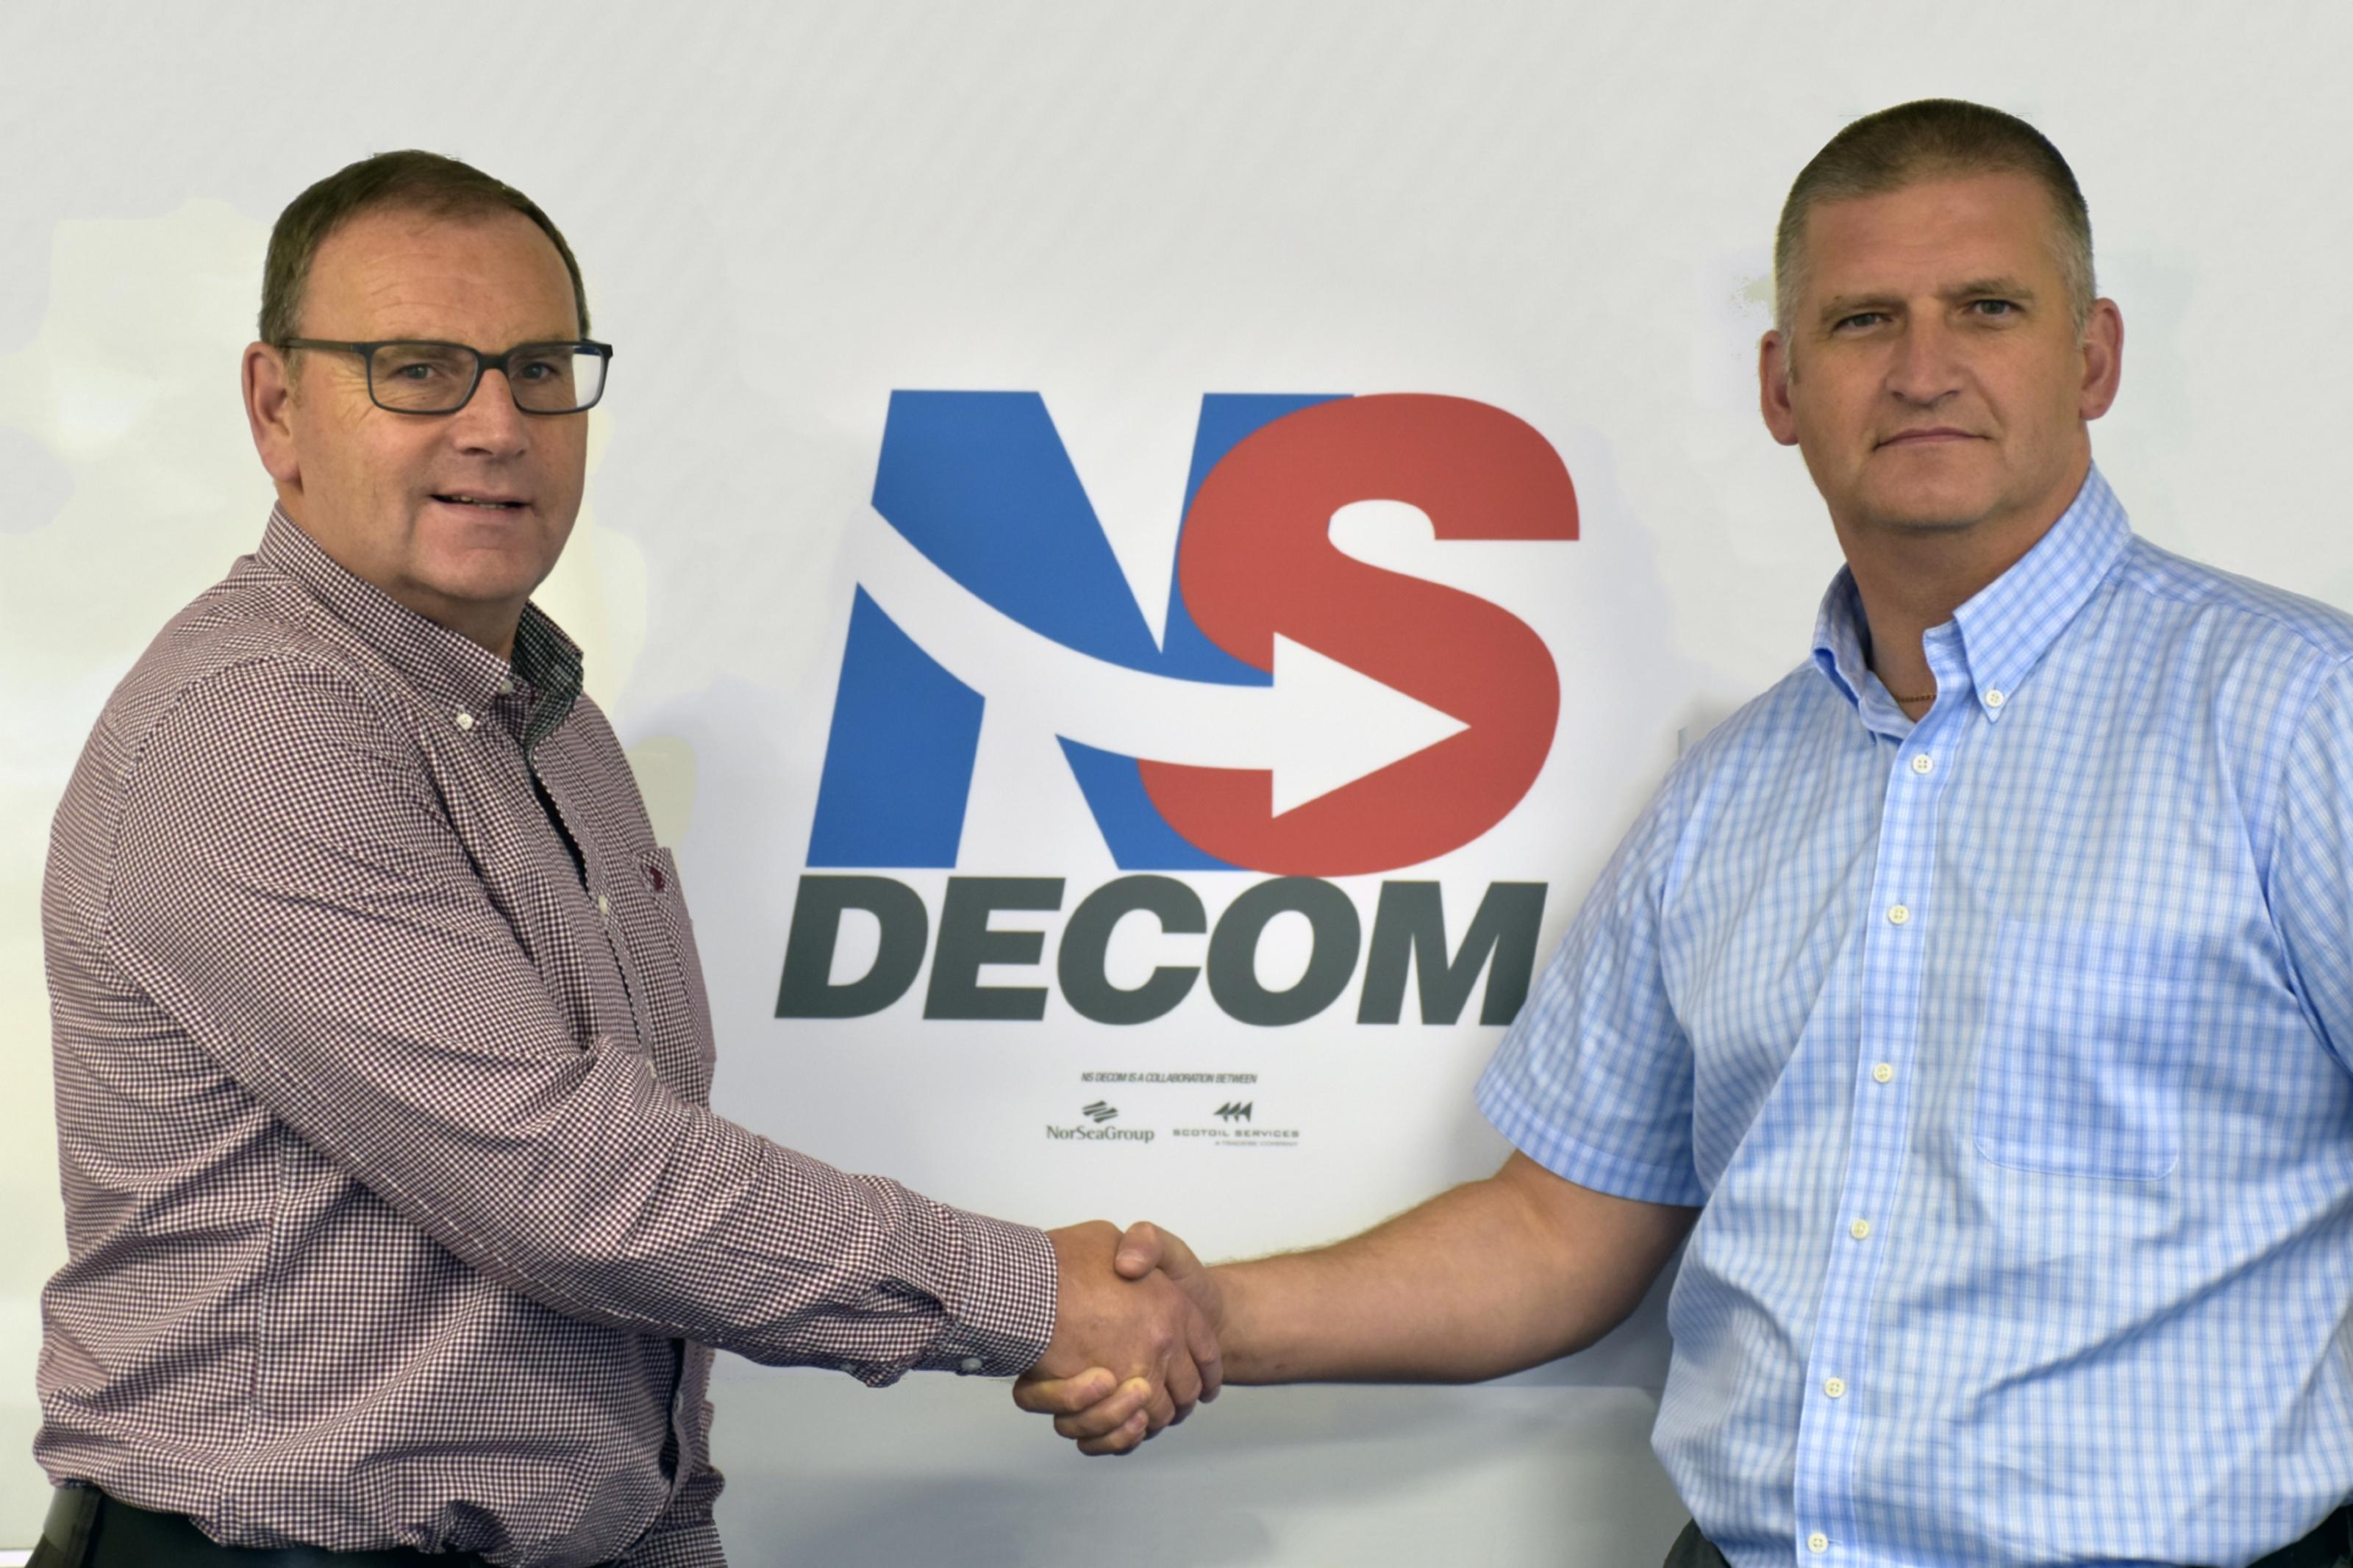 NS Decom Walter Robertson and Craig Smith